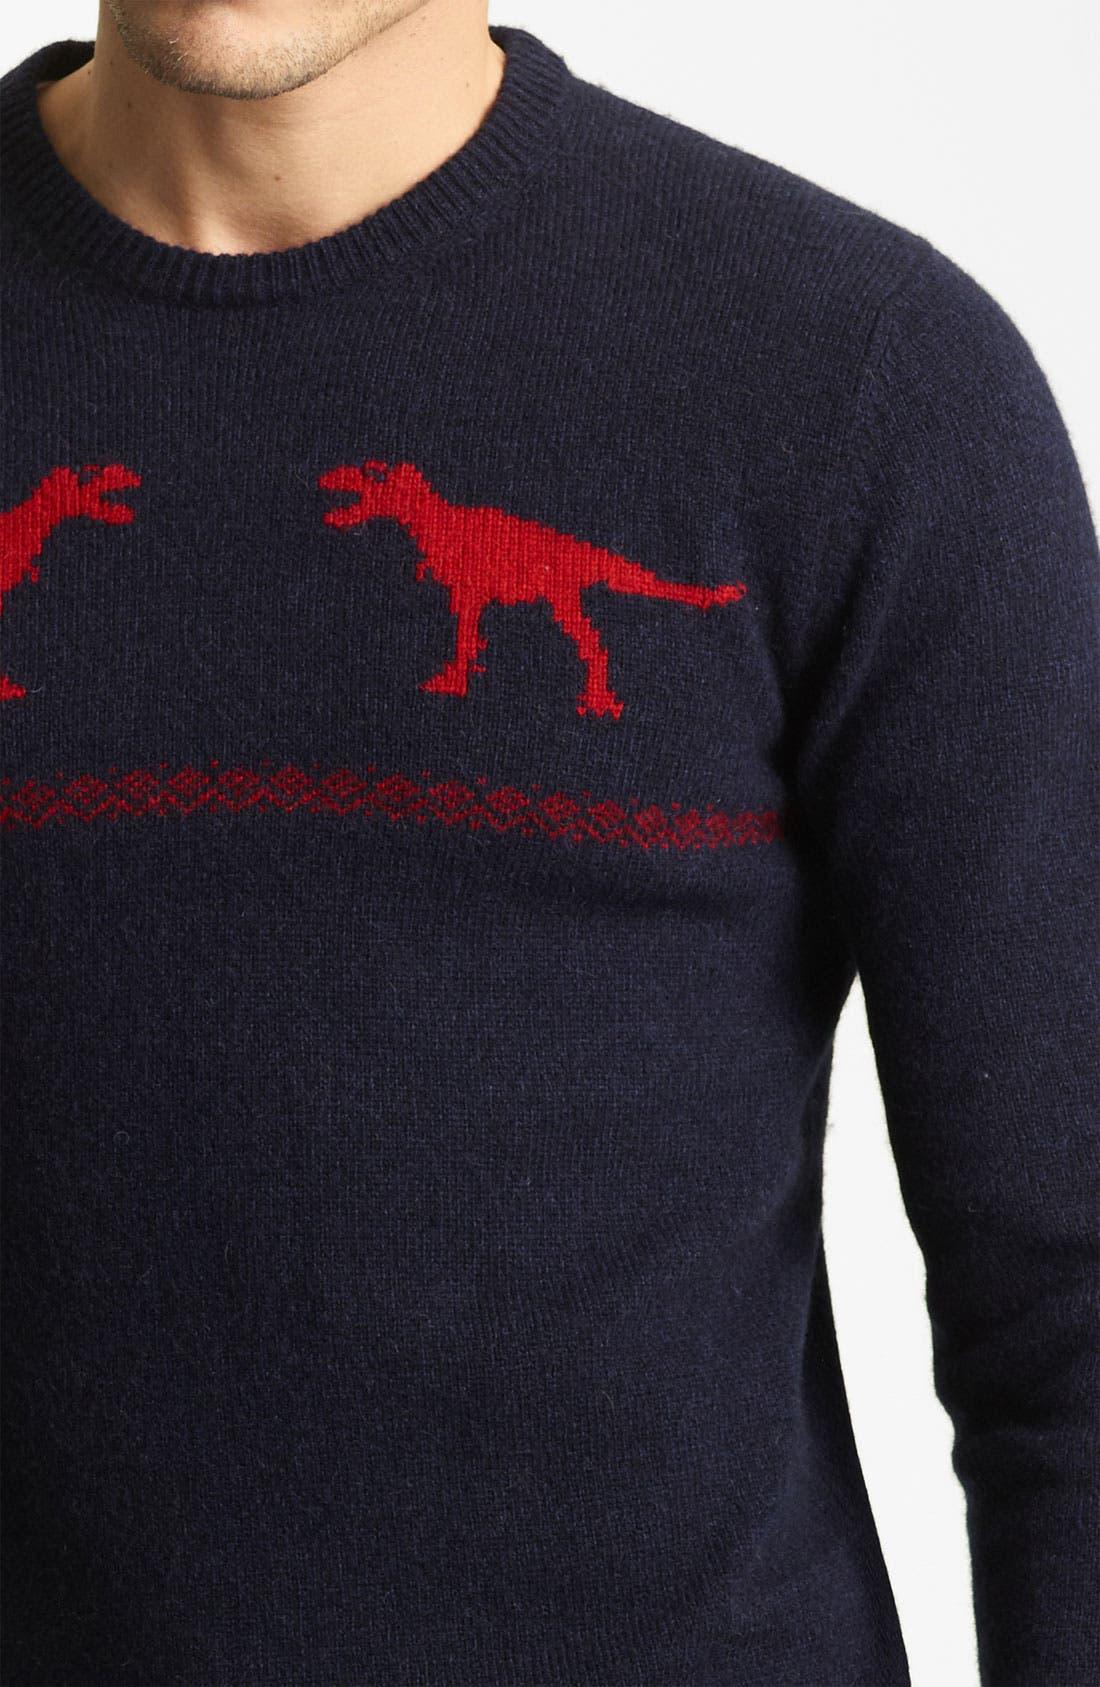 Alternate Image 3  - Jil Sander Crewneck Sweater